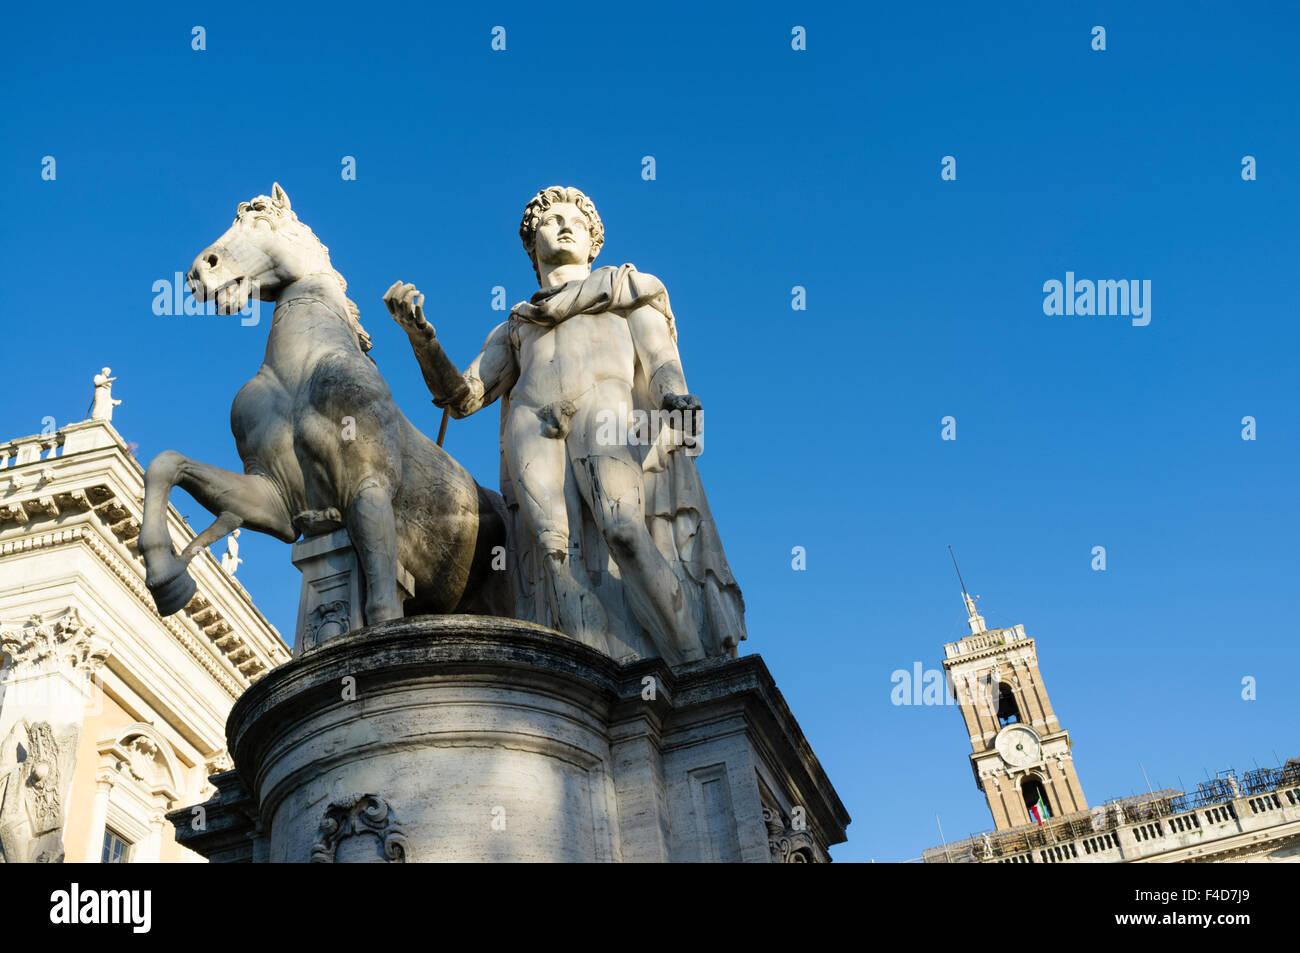 Castor and Pollux monument on top of the of the cordonata on Piazza del Campidoglio,Capitoline Hill. Rome, Italy - Stock Image